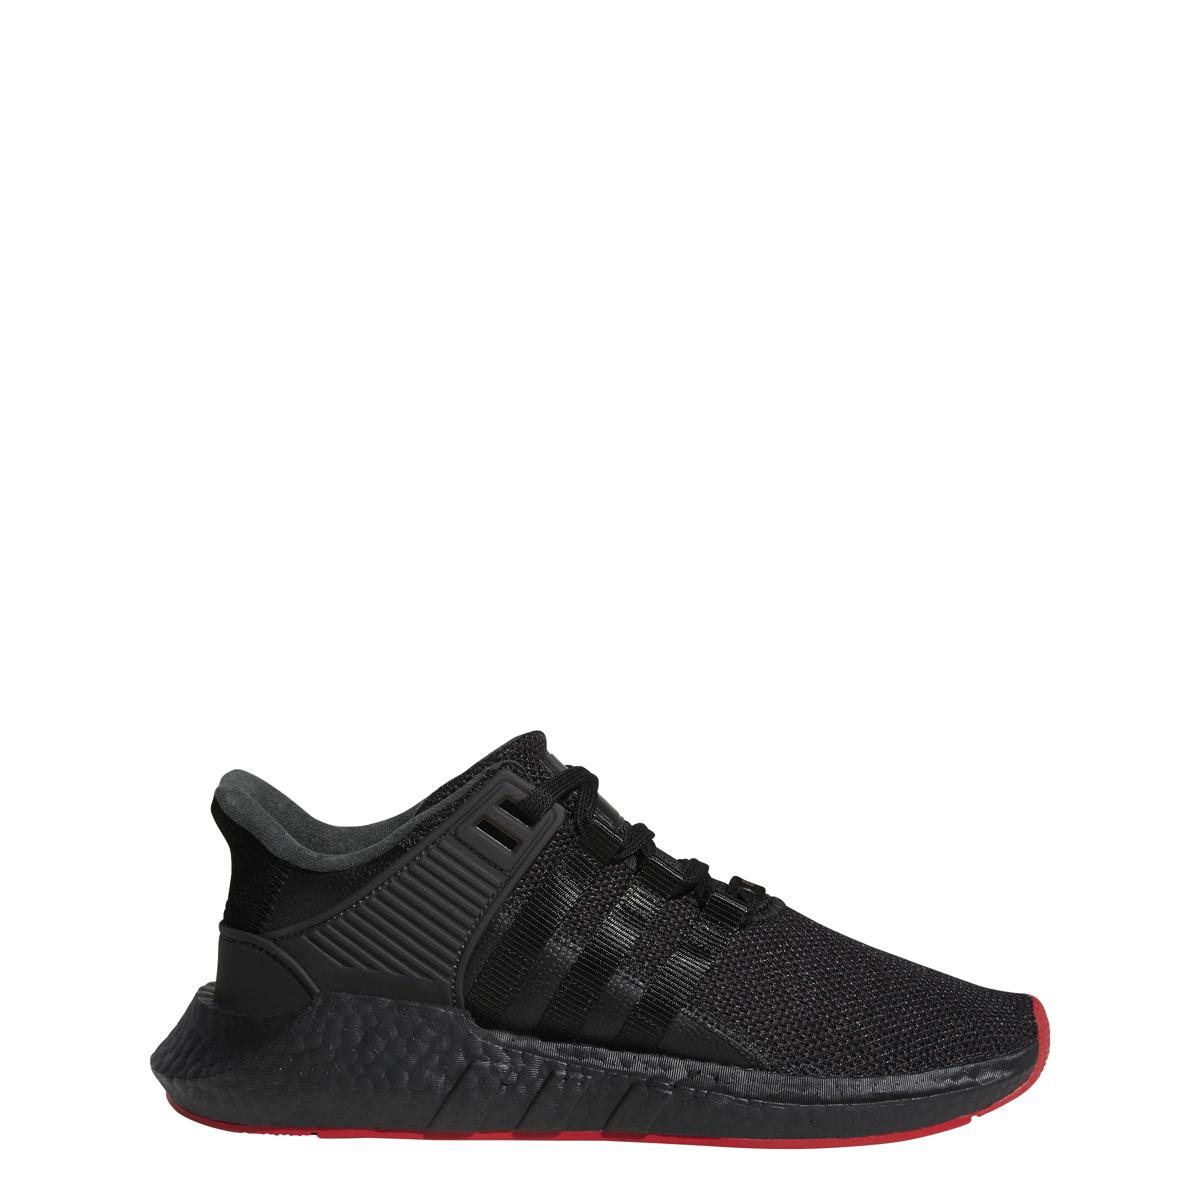 Adidas EQT Support 93/17 in Black/Black